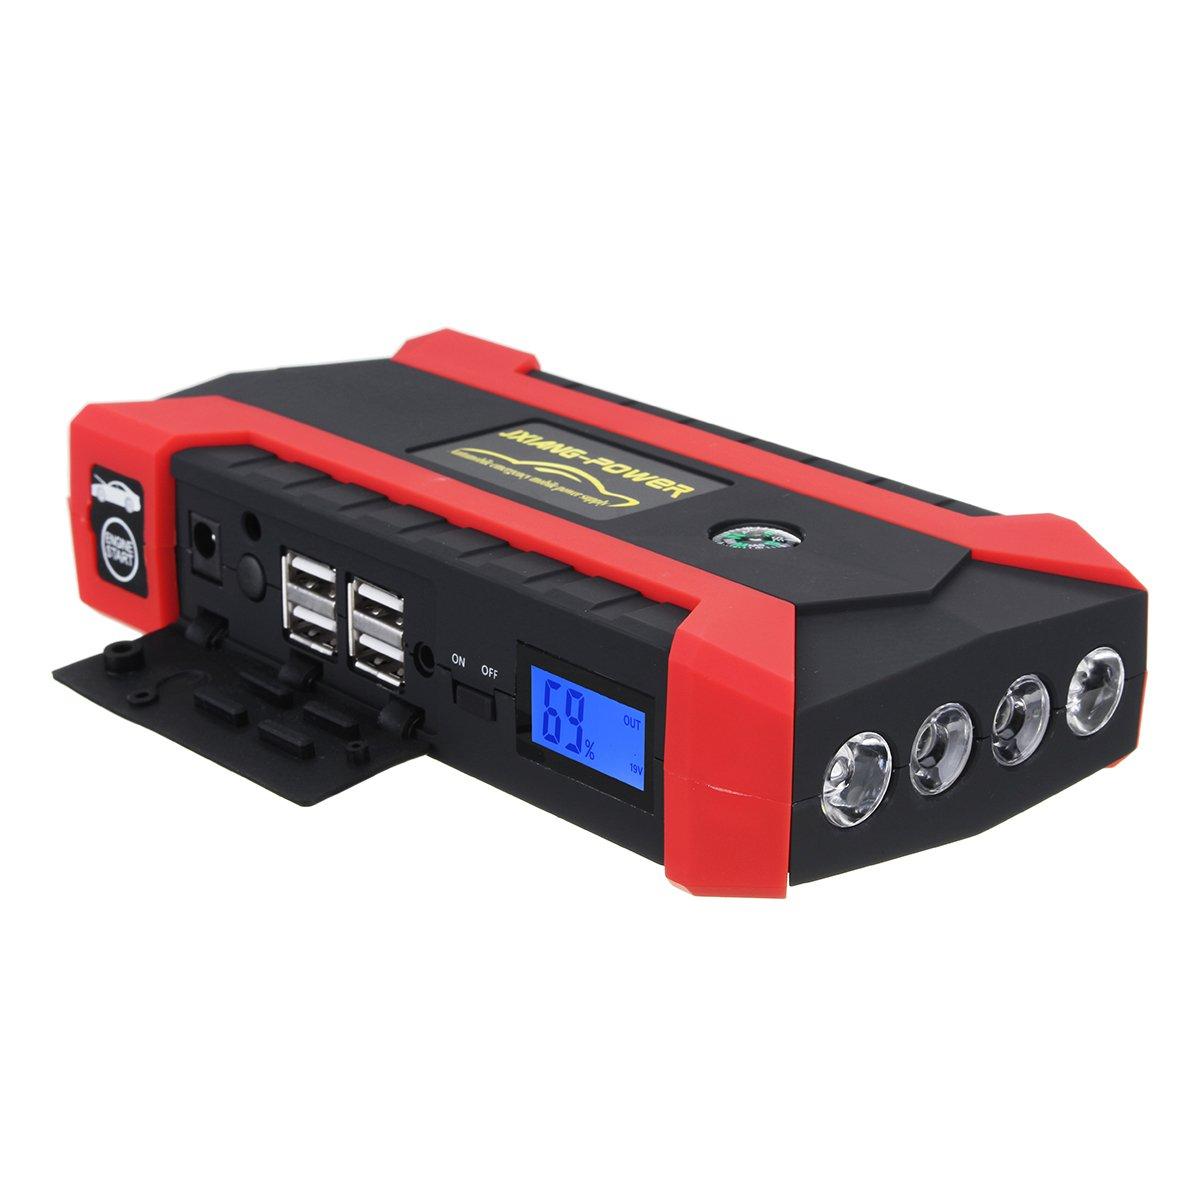 HITSAN 89800 mAh 12V 4 USB Car Jump Starter Pack Booster Charger Battery Power Bank Kit One Piece